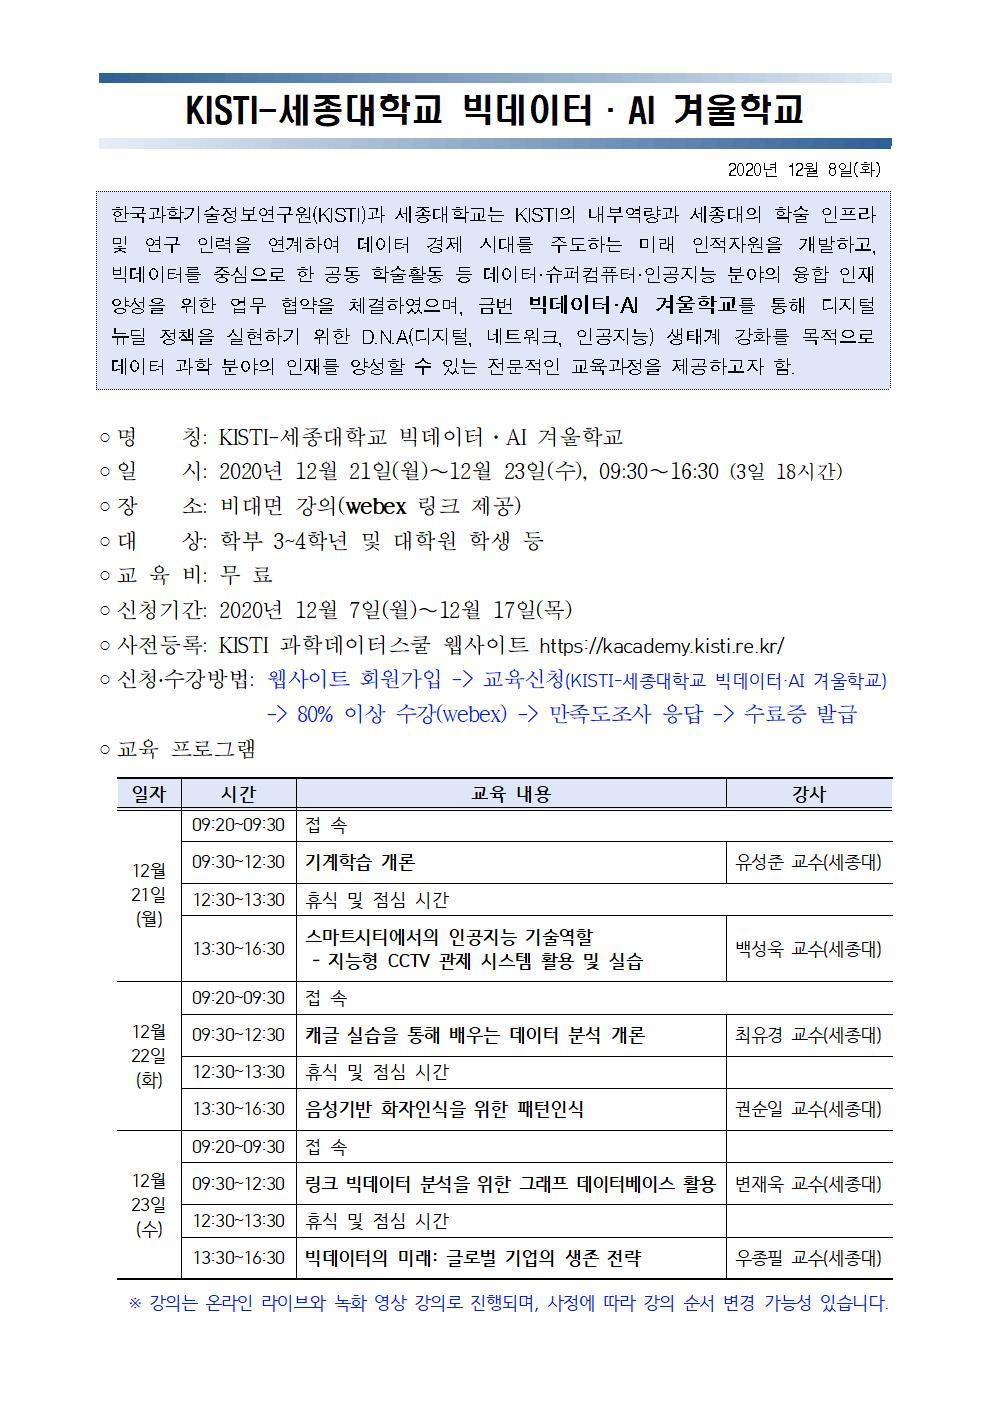 KISTI-세종대 빅데이터·AI 겨울학교 개최(안)001.jpg